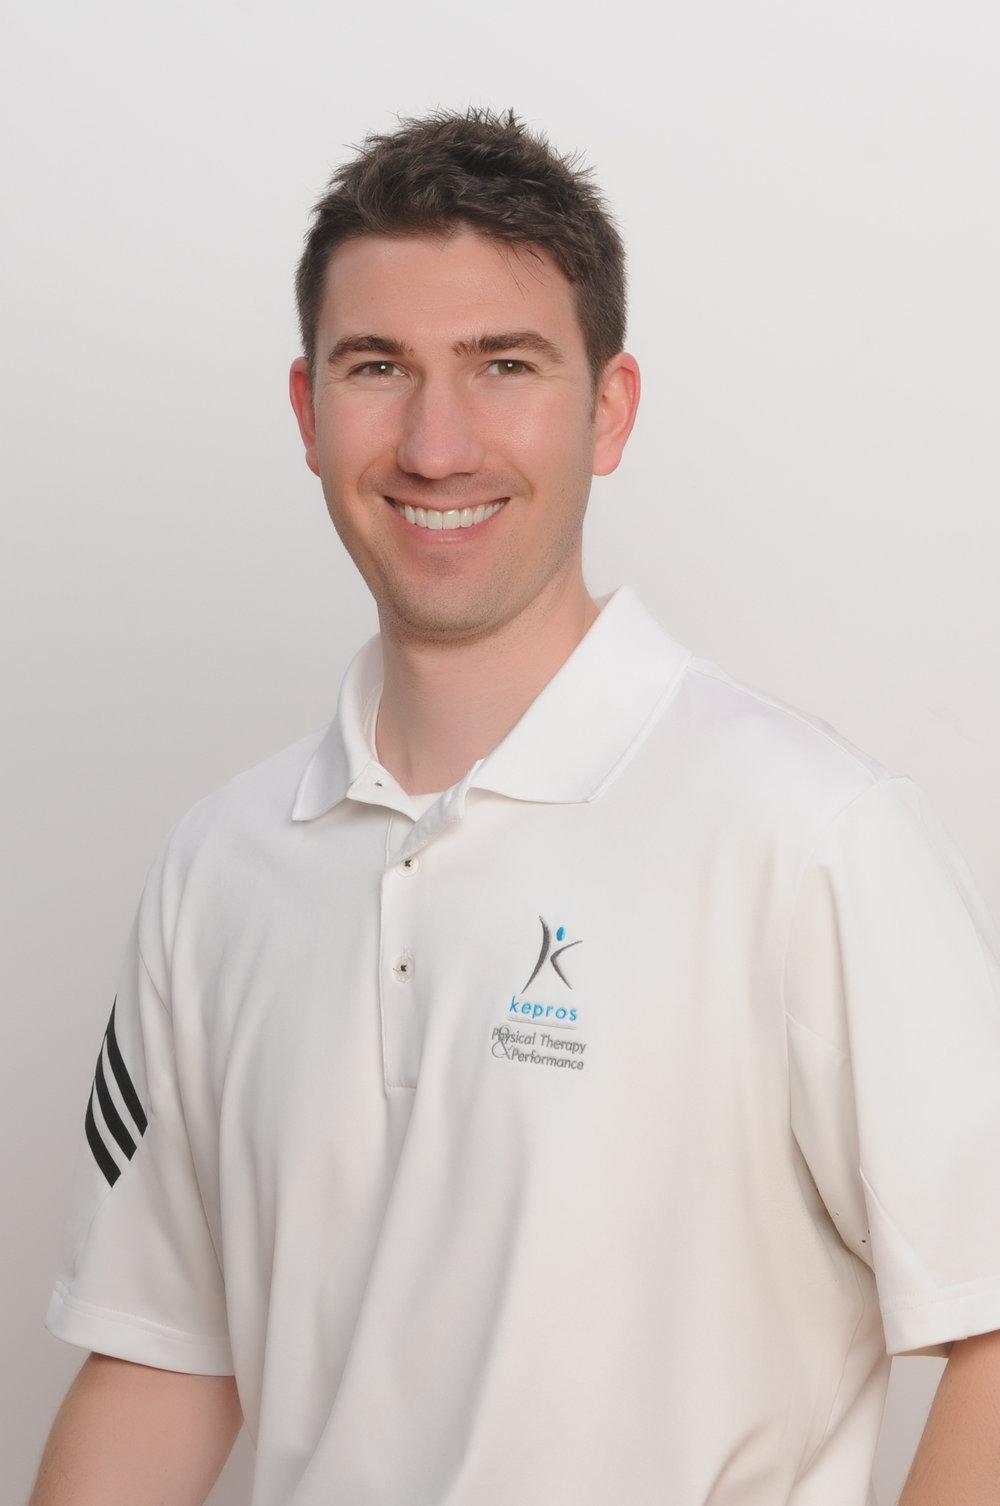 Doug Perkins, PT, DPT